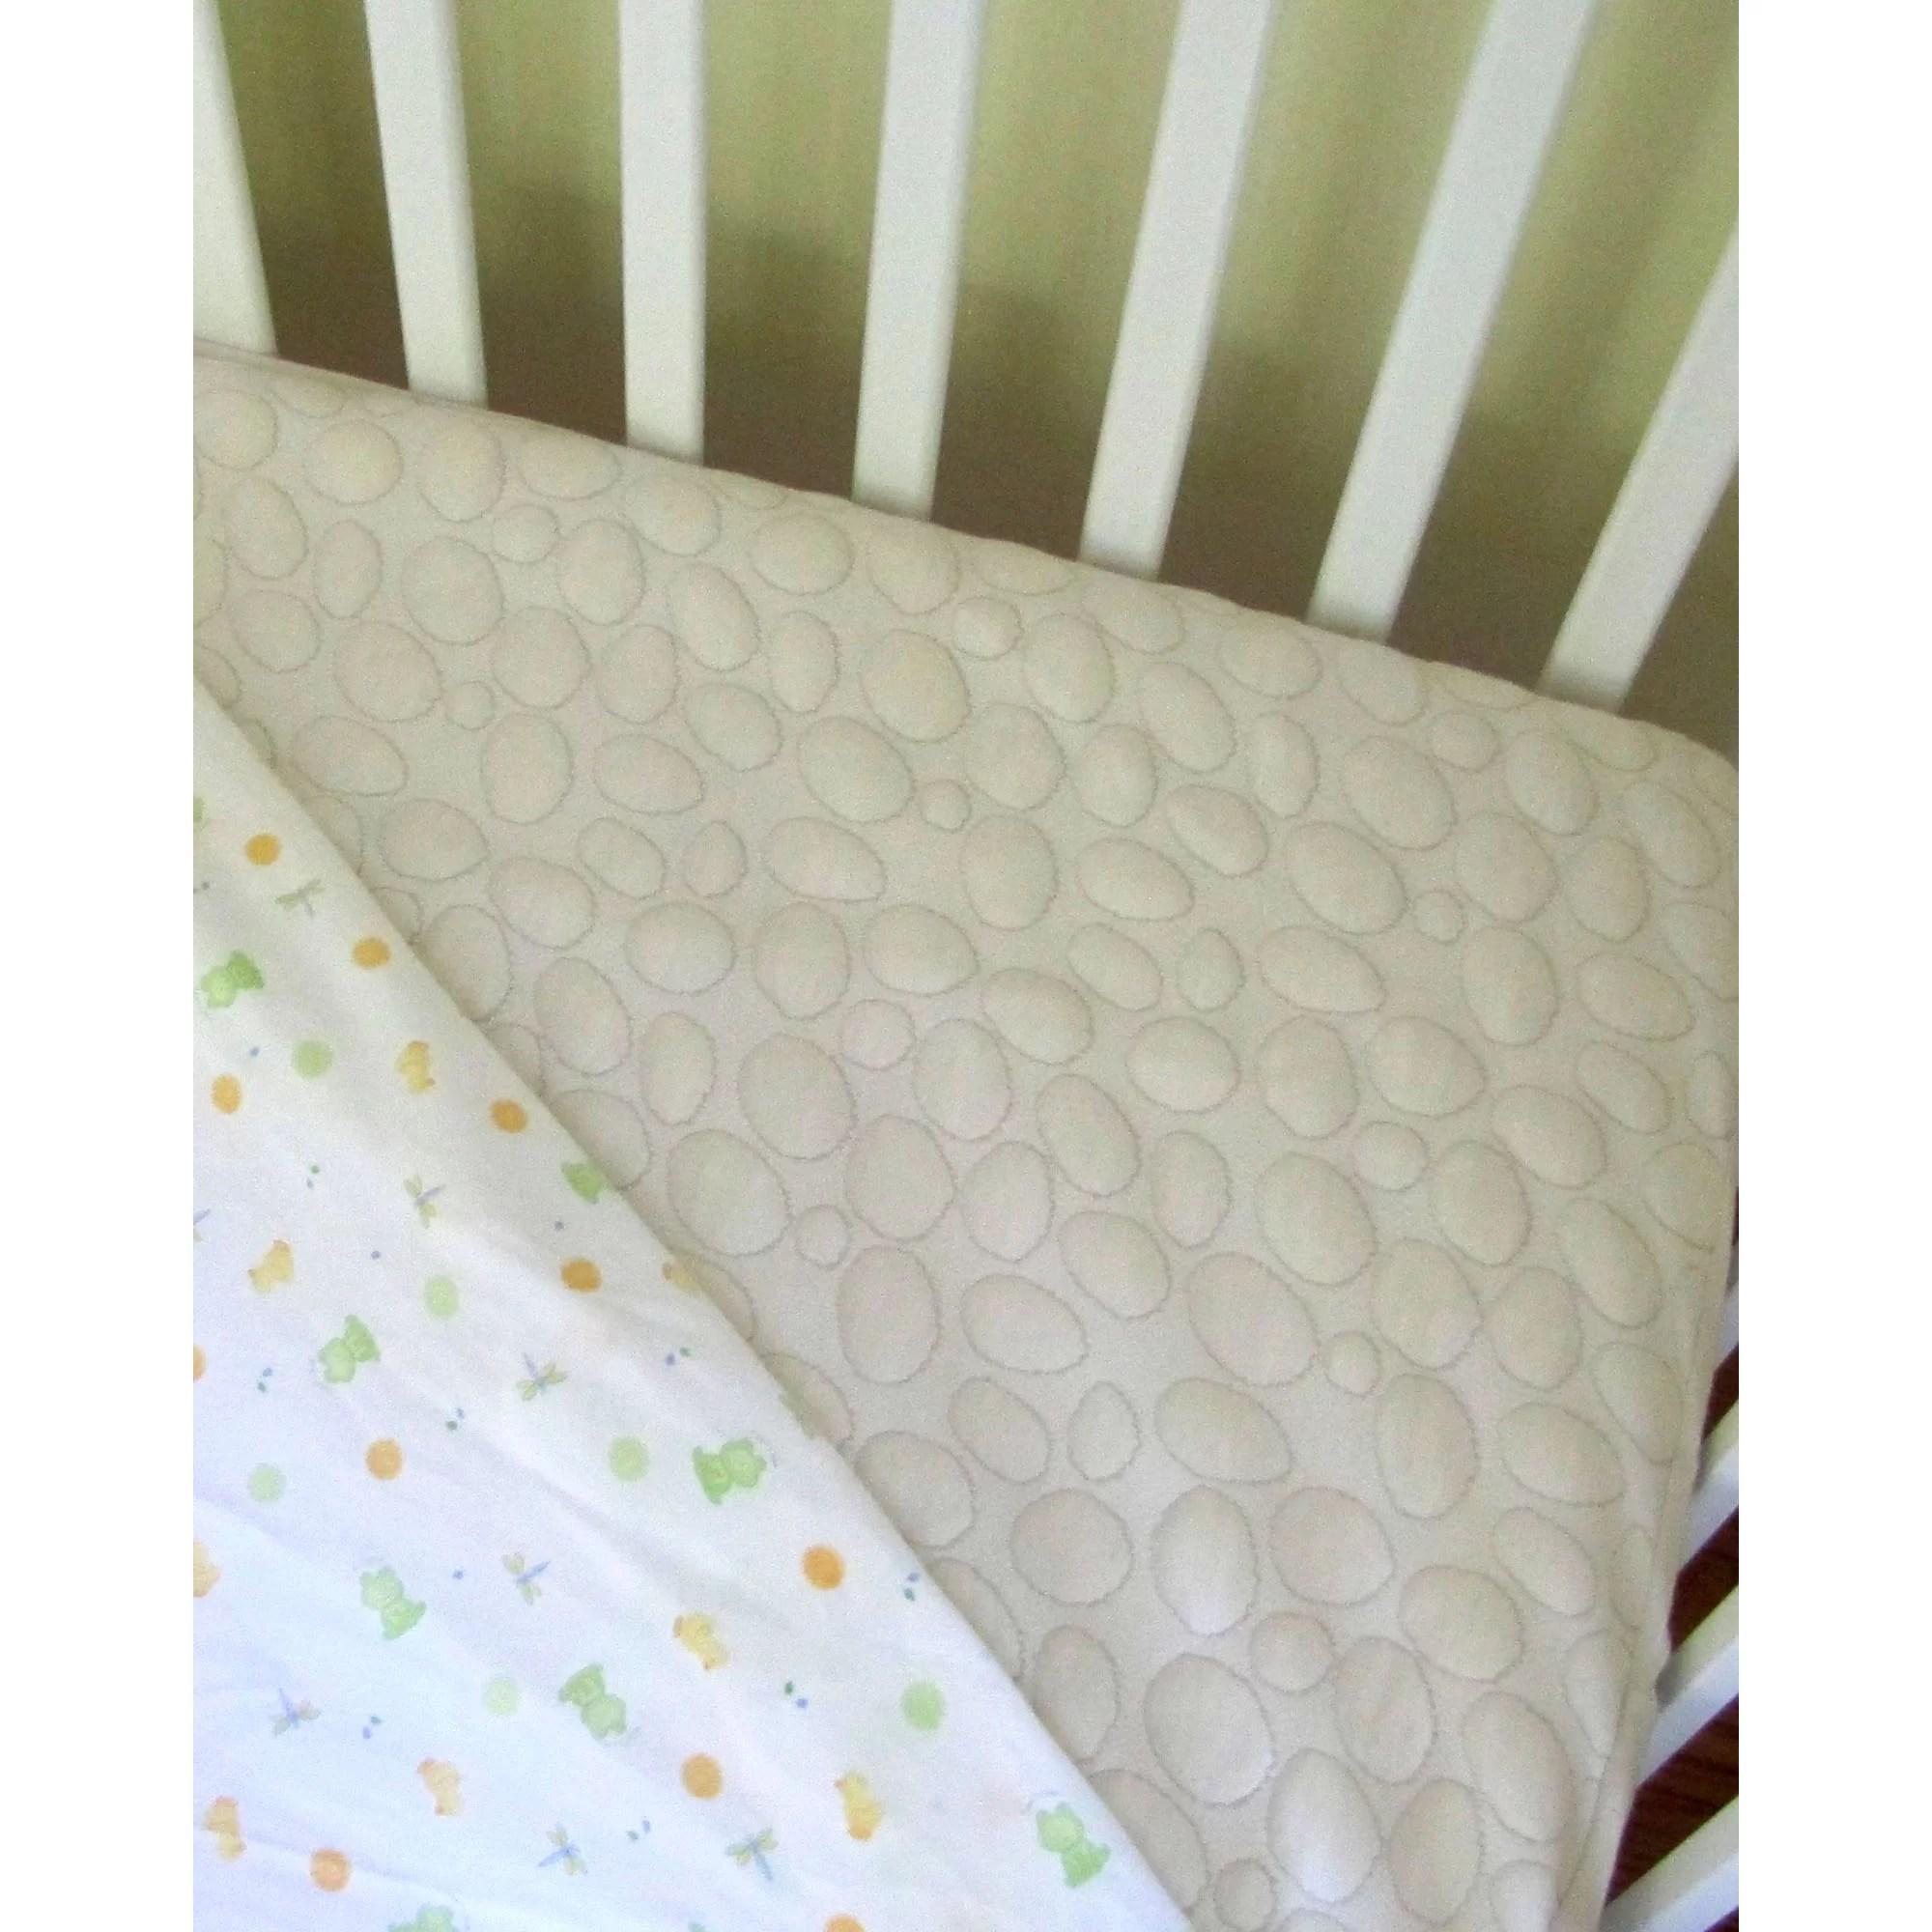 Dream Decor Organic Smooth Top Natural Fiber Crib Mattress Protector  Reviews  Wayfair